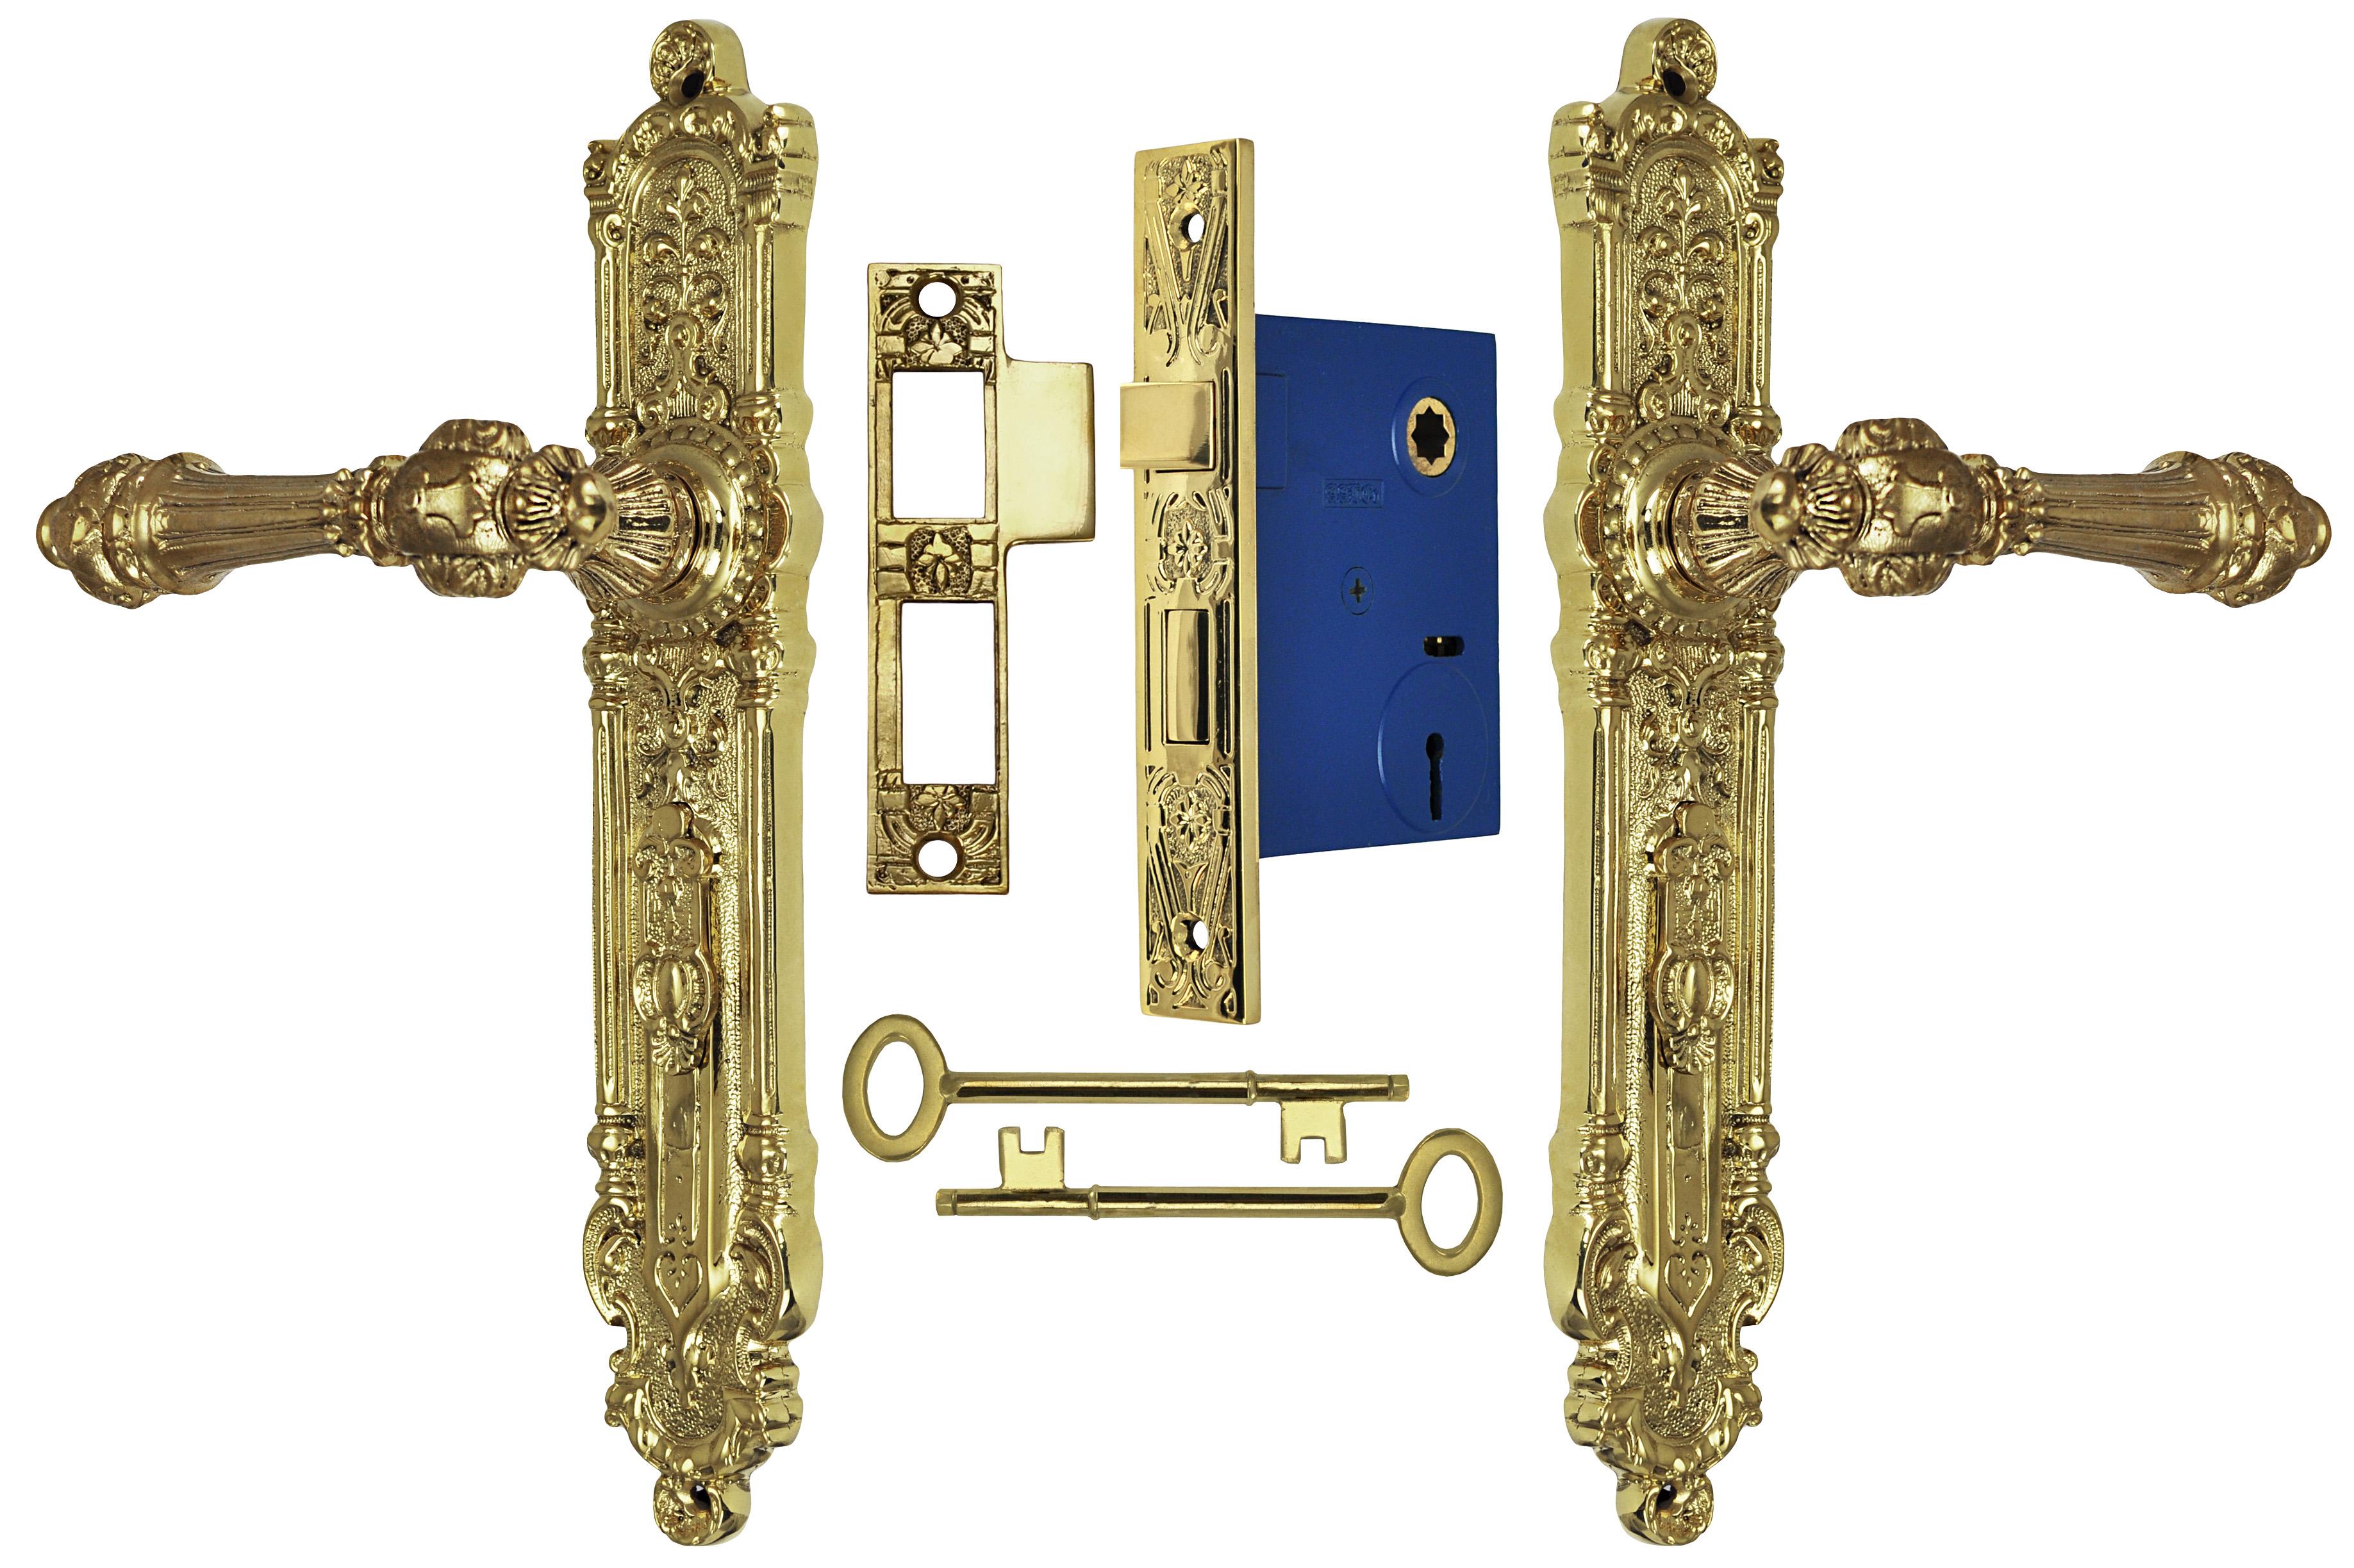 Unlacquered Brass Cabinet Hardware